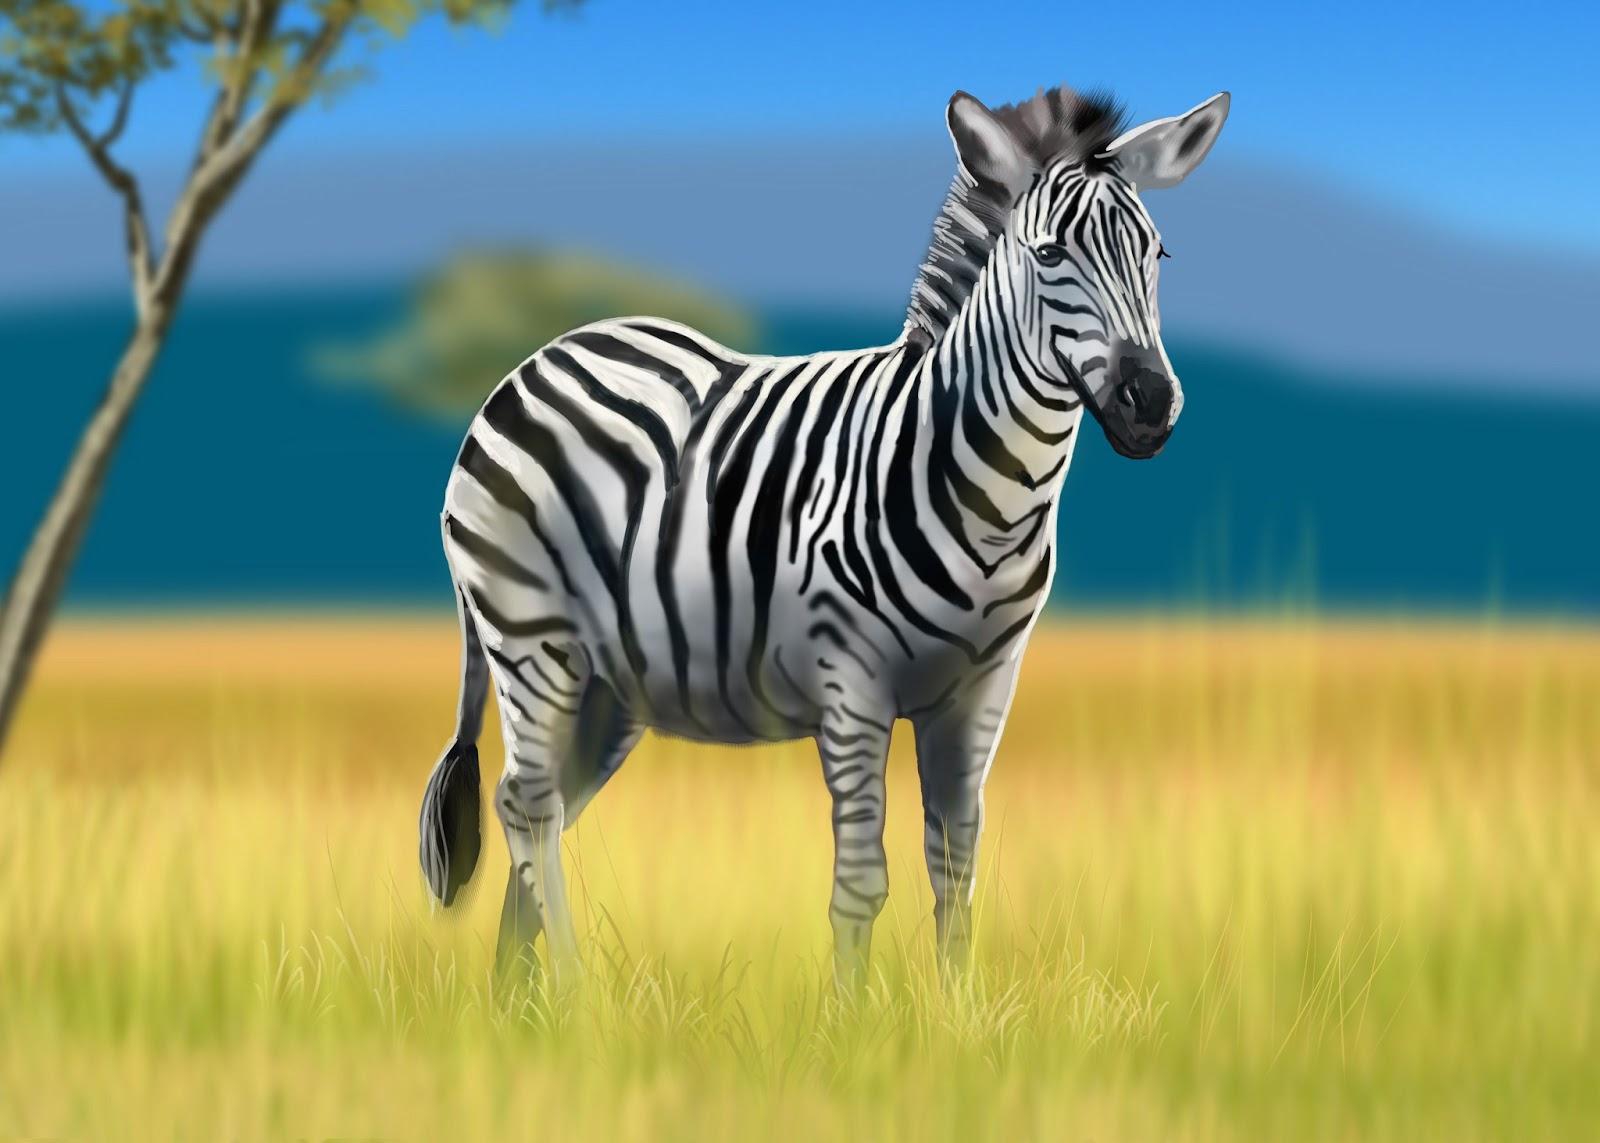 Zebra Facts For Kids | Zebra Diet, Habitat, Behavior, and Characteristics